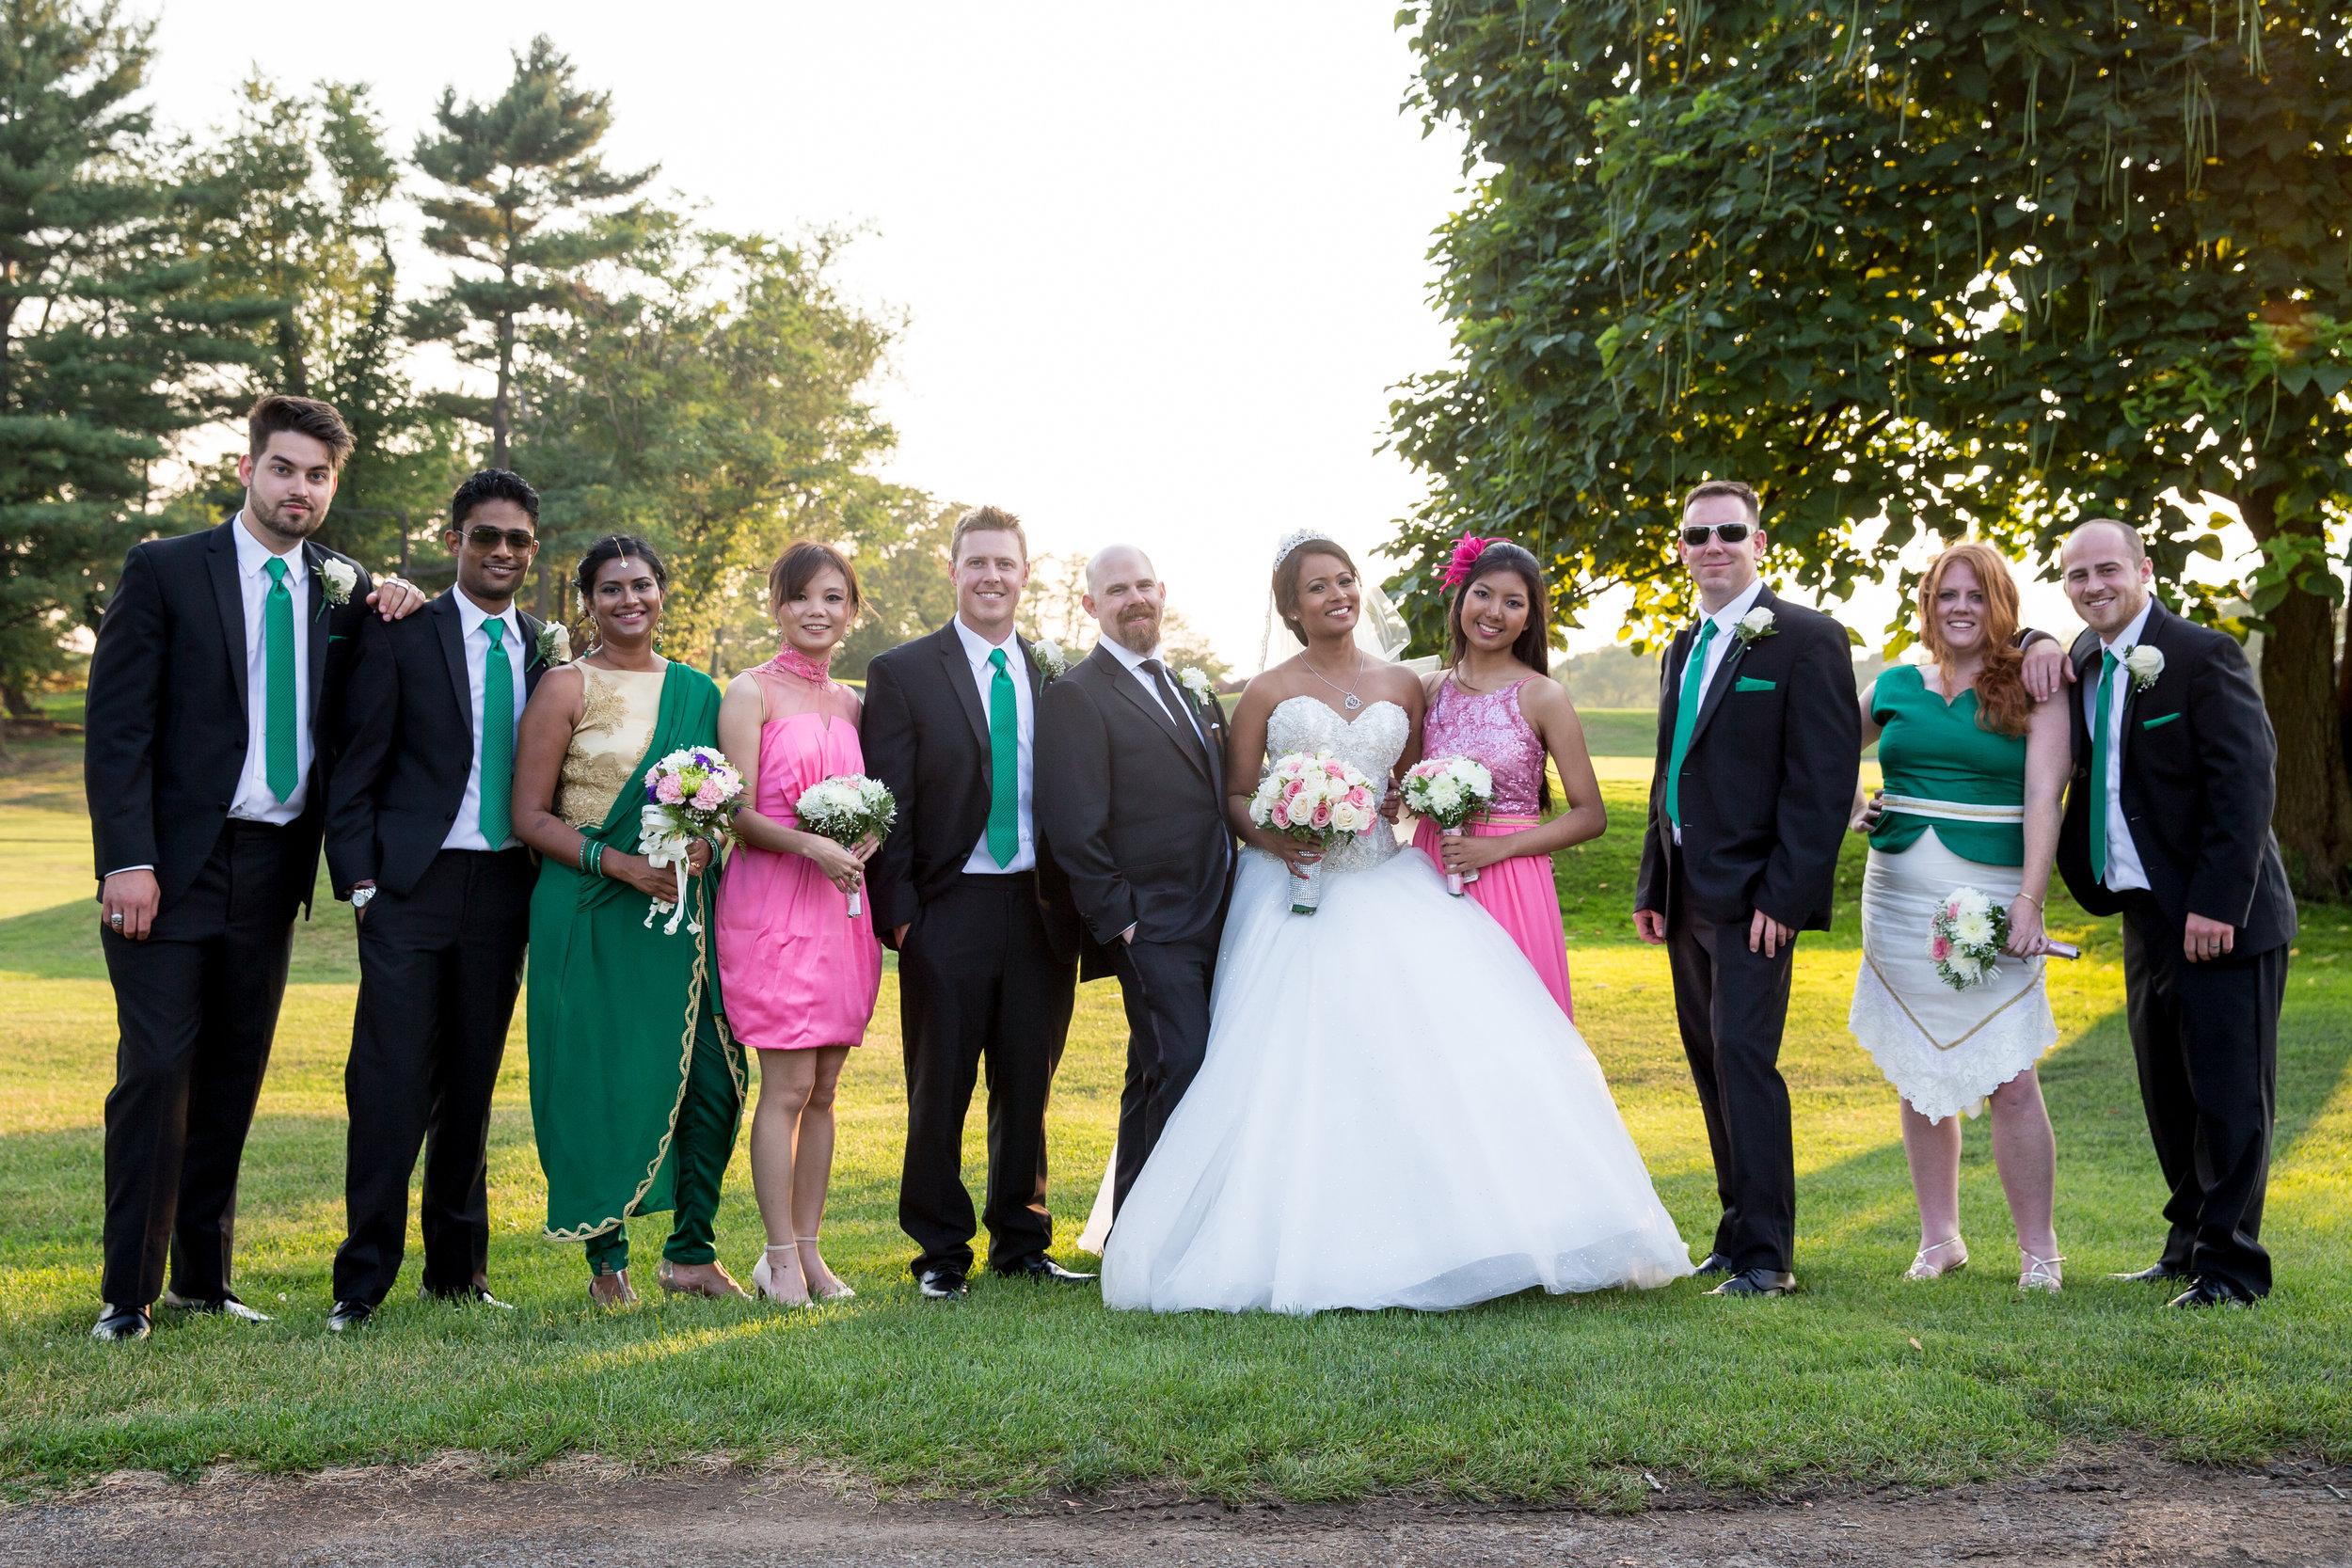 Douglaston Manor Wedding - Trinity Lutheran Church Astoria Wedding -Craig Paulson Photography